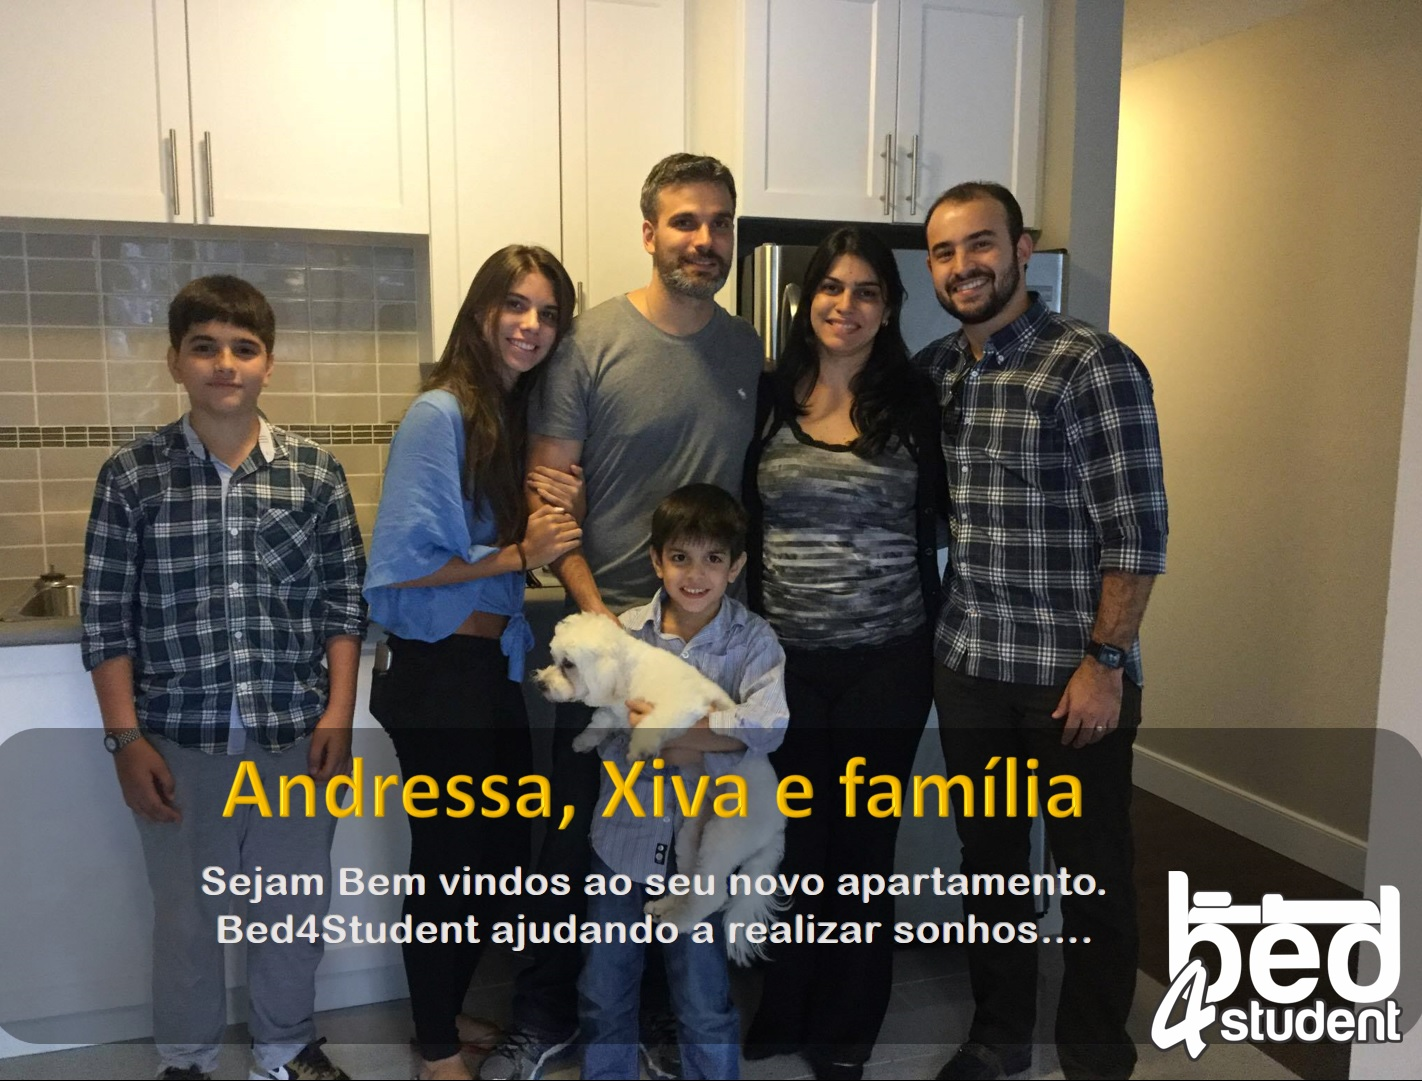 Andressa, Xiva e família